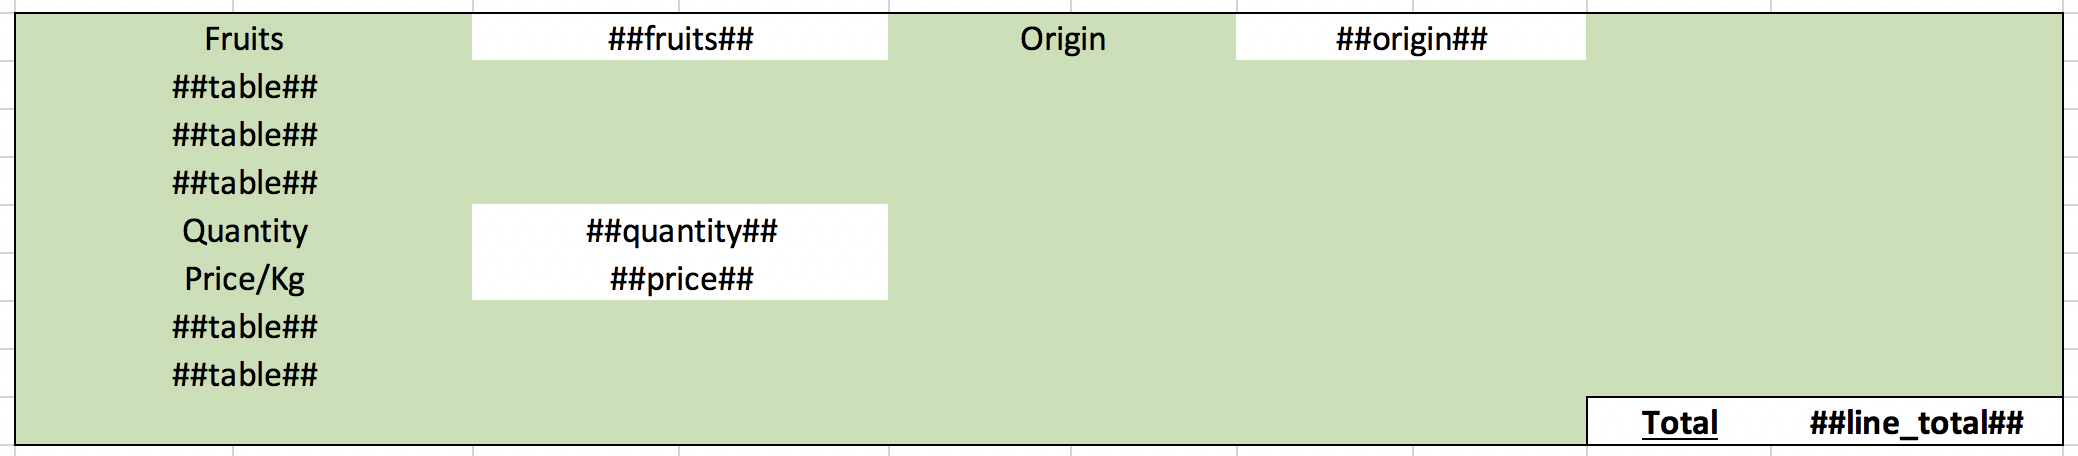 Bulk data with empty lines